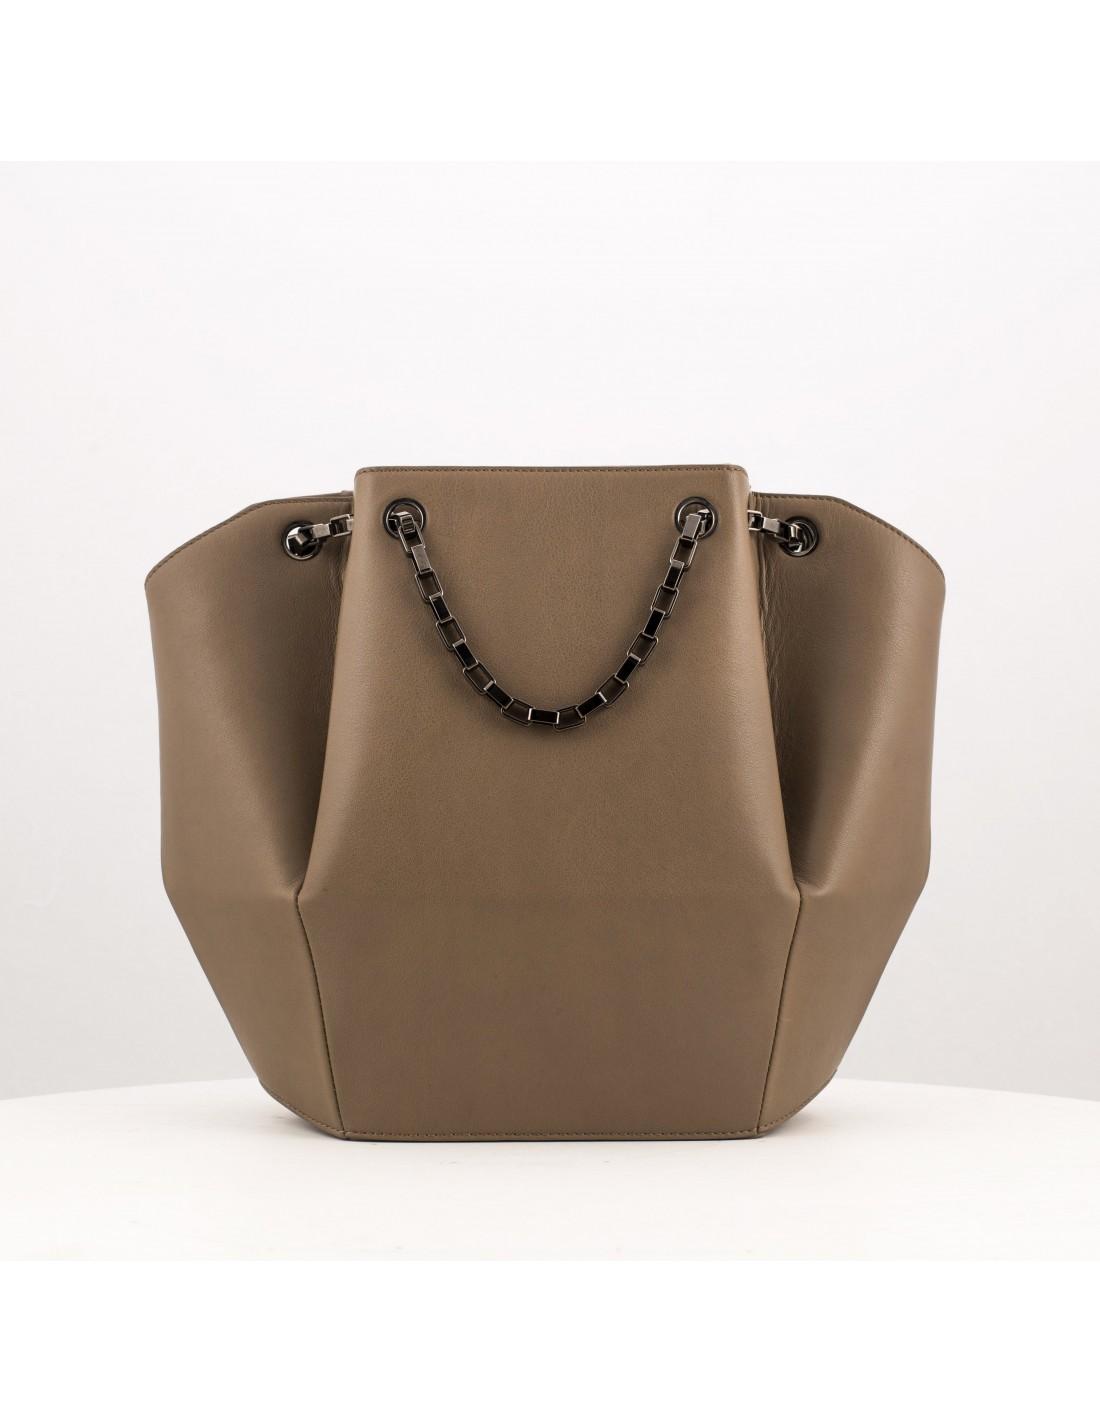 927926a6991c LC.2-23 – Taupe - LABRUYERE luxury handbag